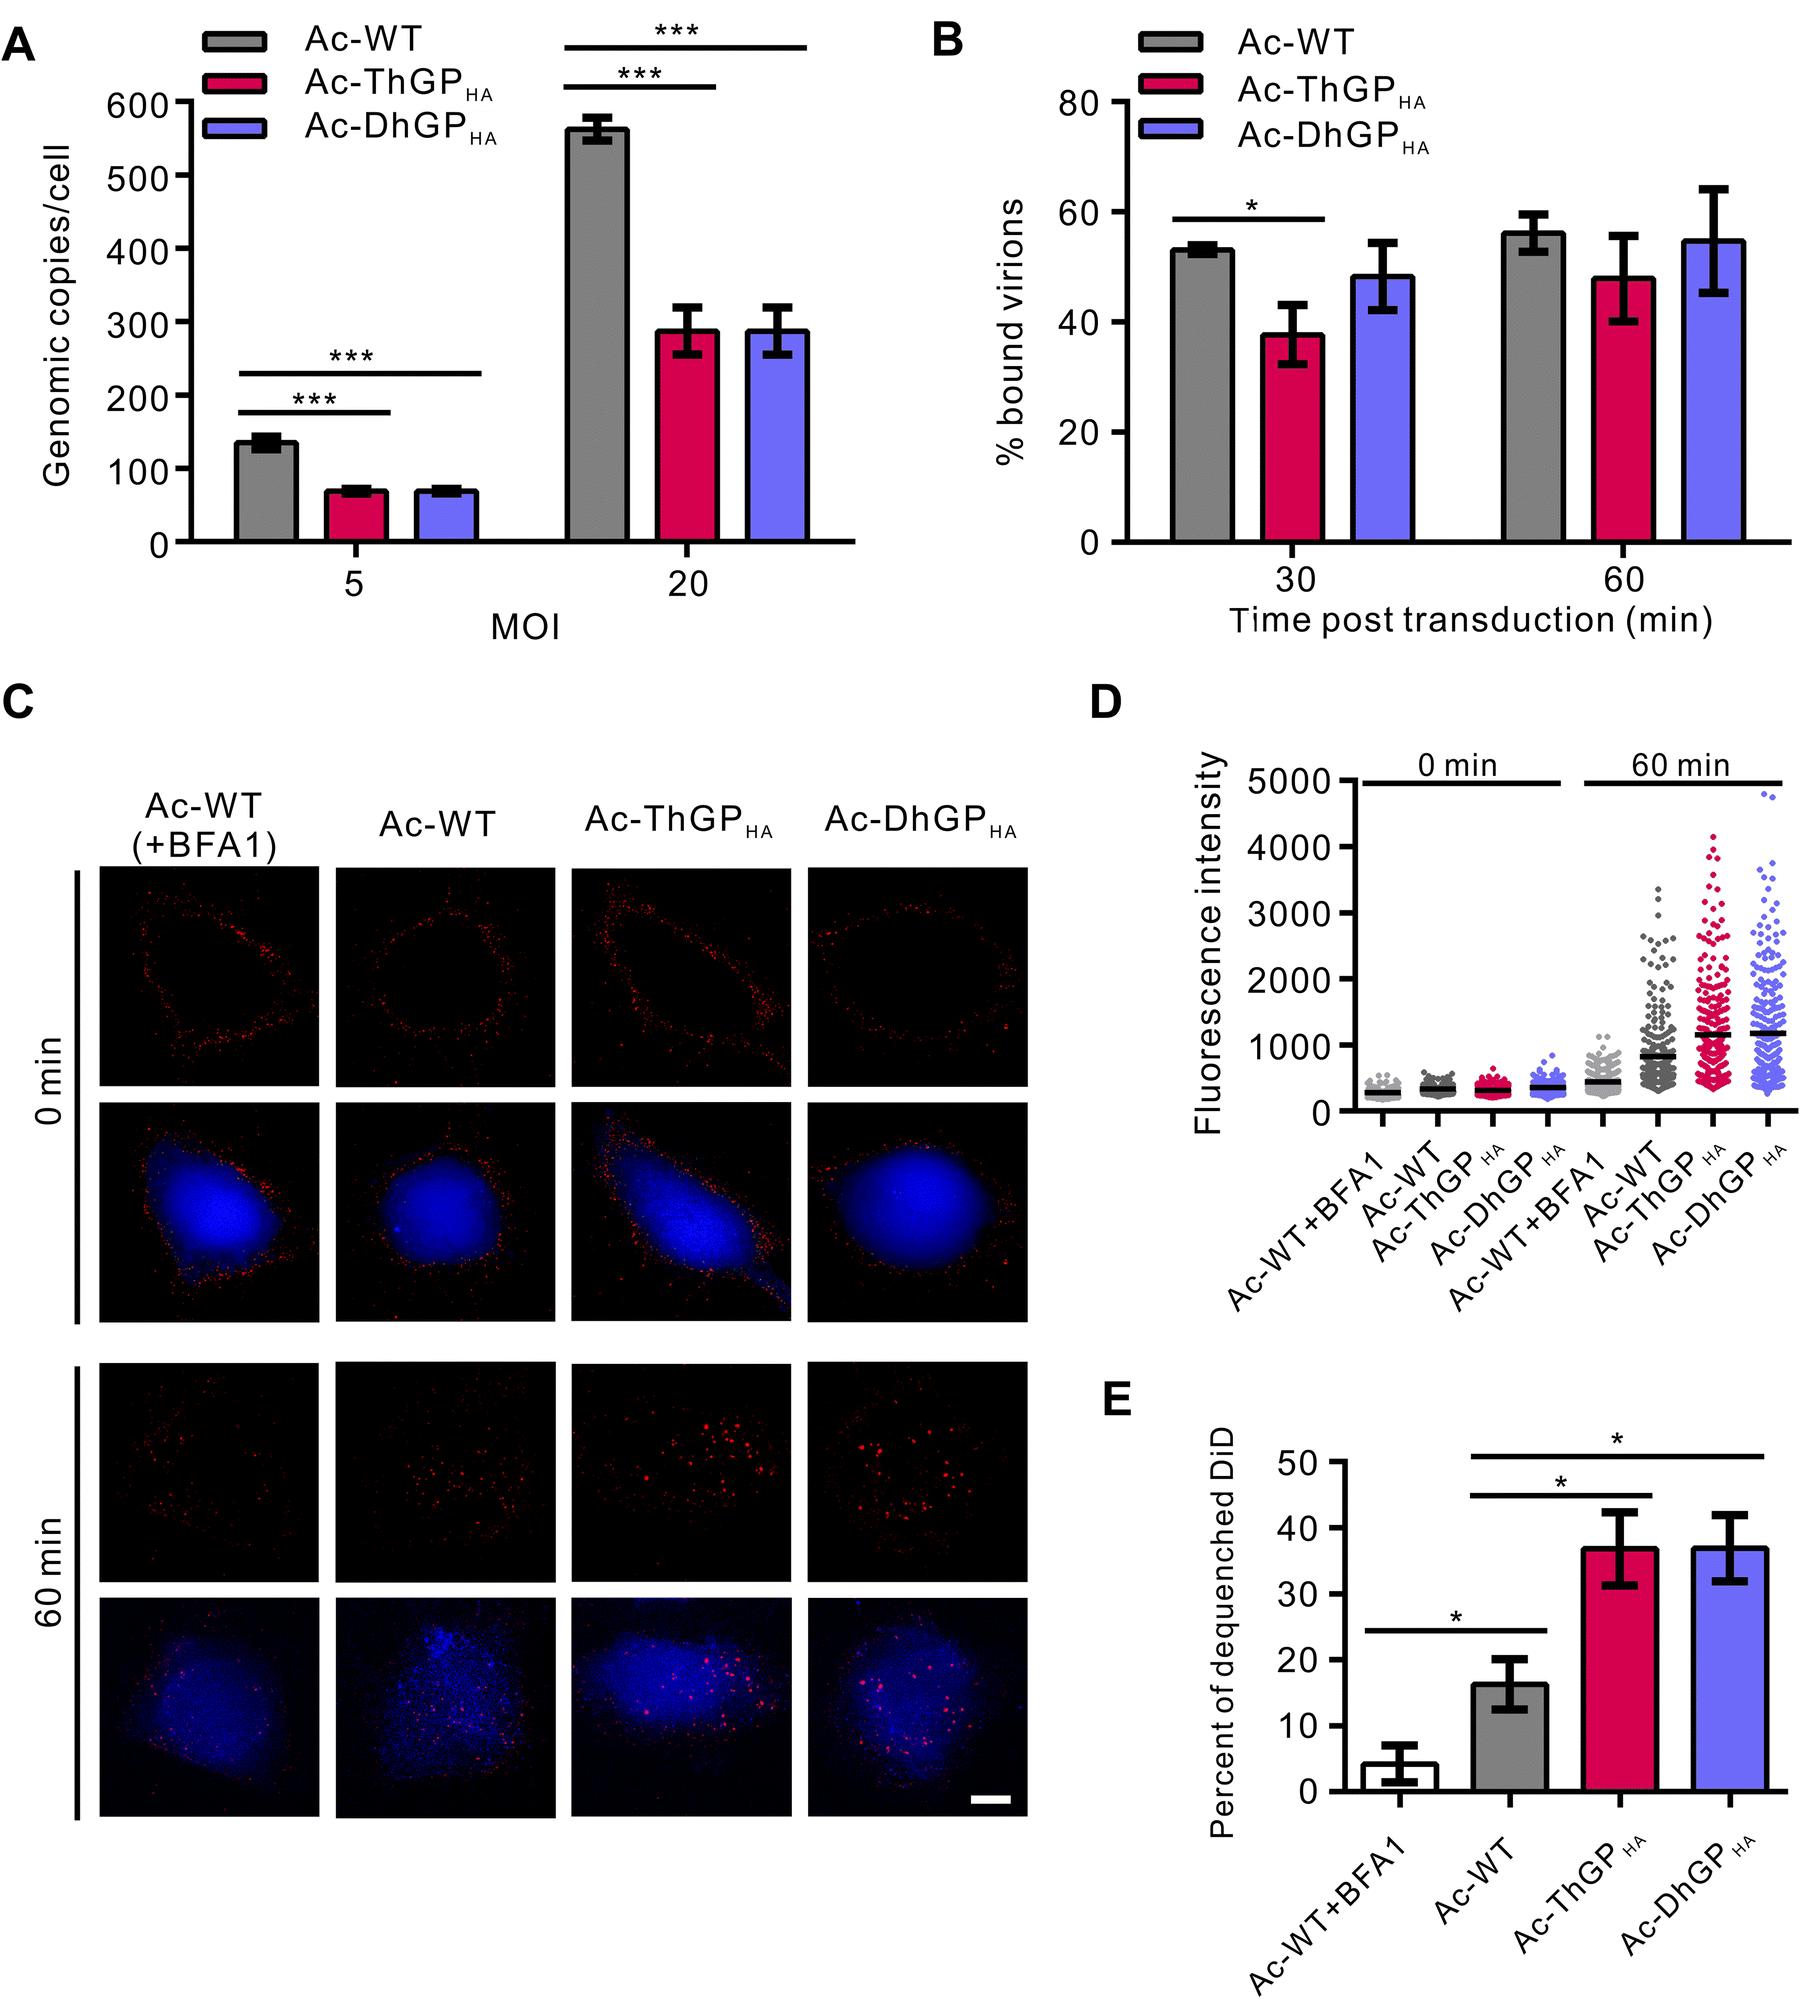 Improving Baculovirus Transduction of Mammalian Cells by